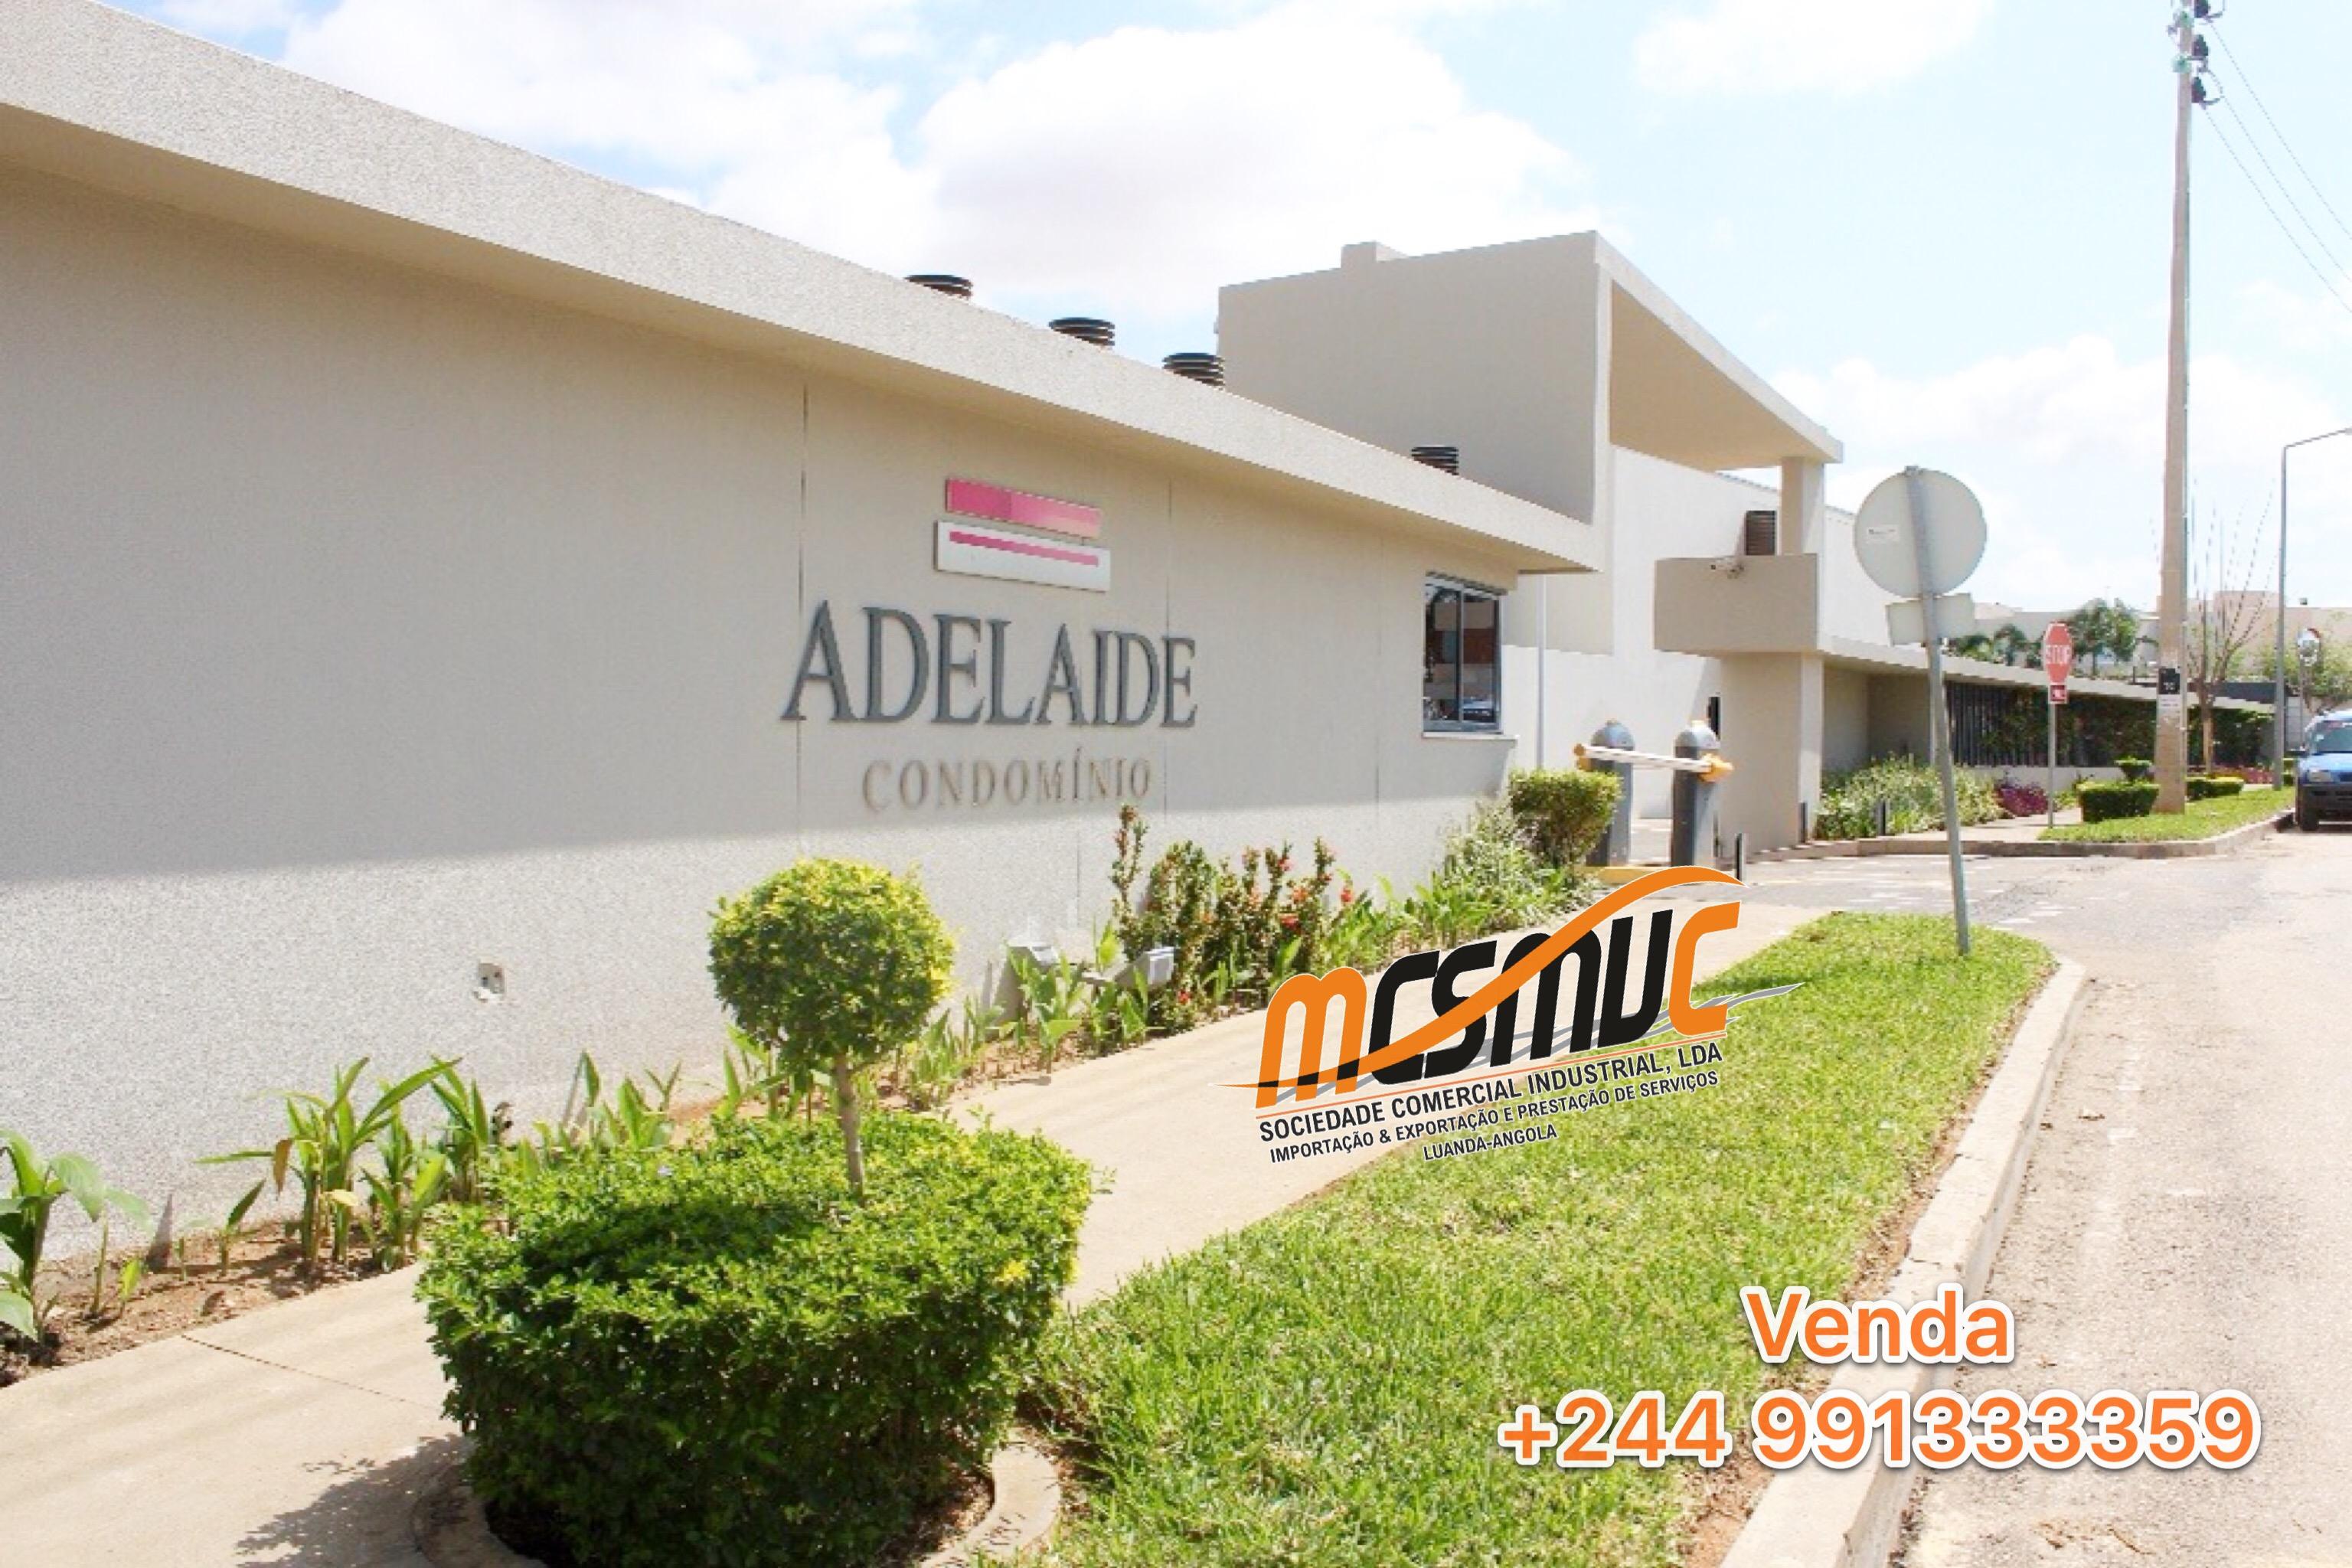 Moradia T4 Condomínio Adelaide